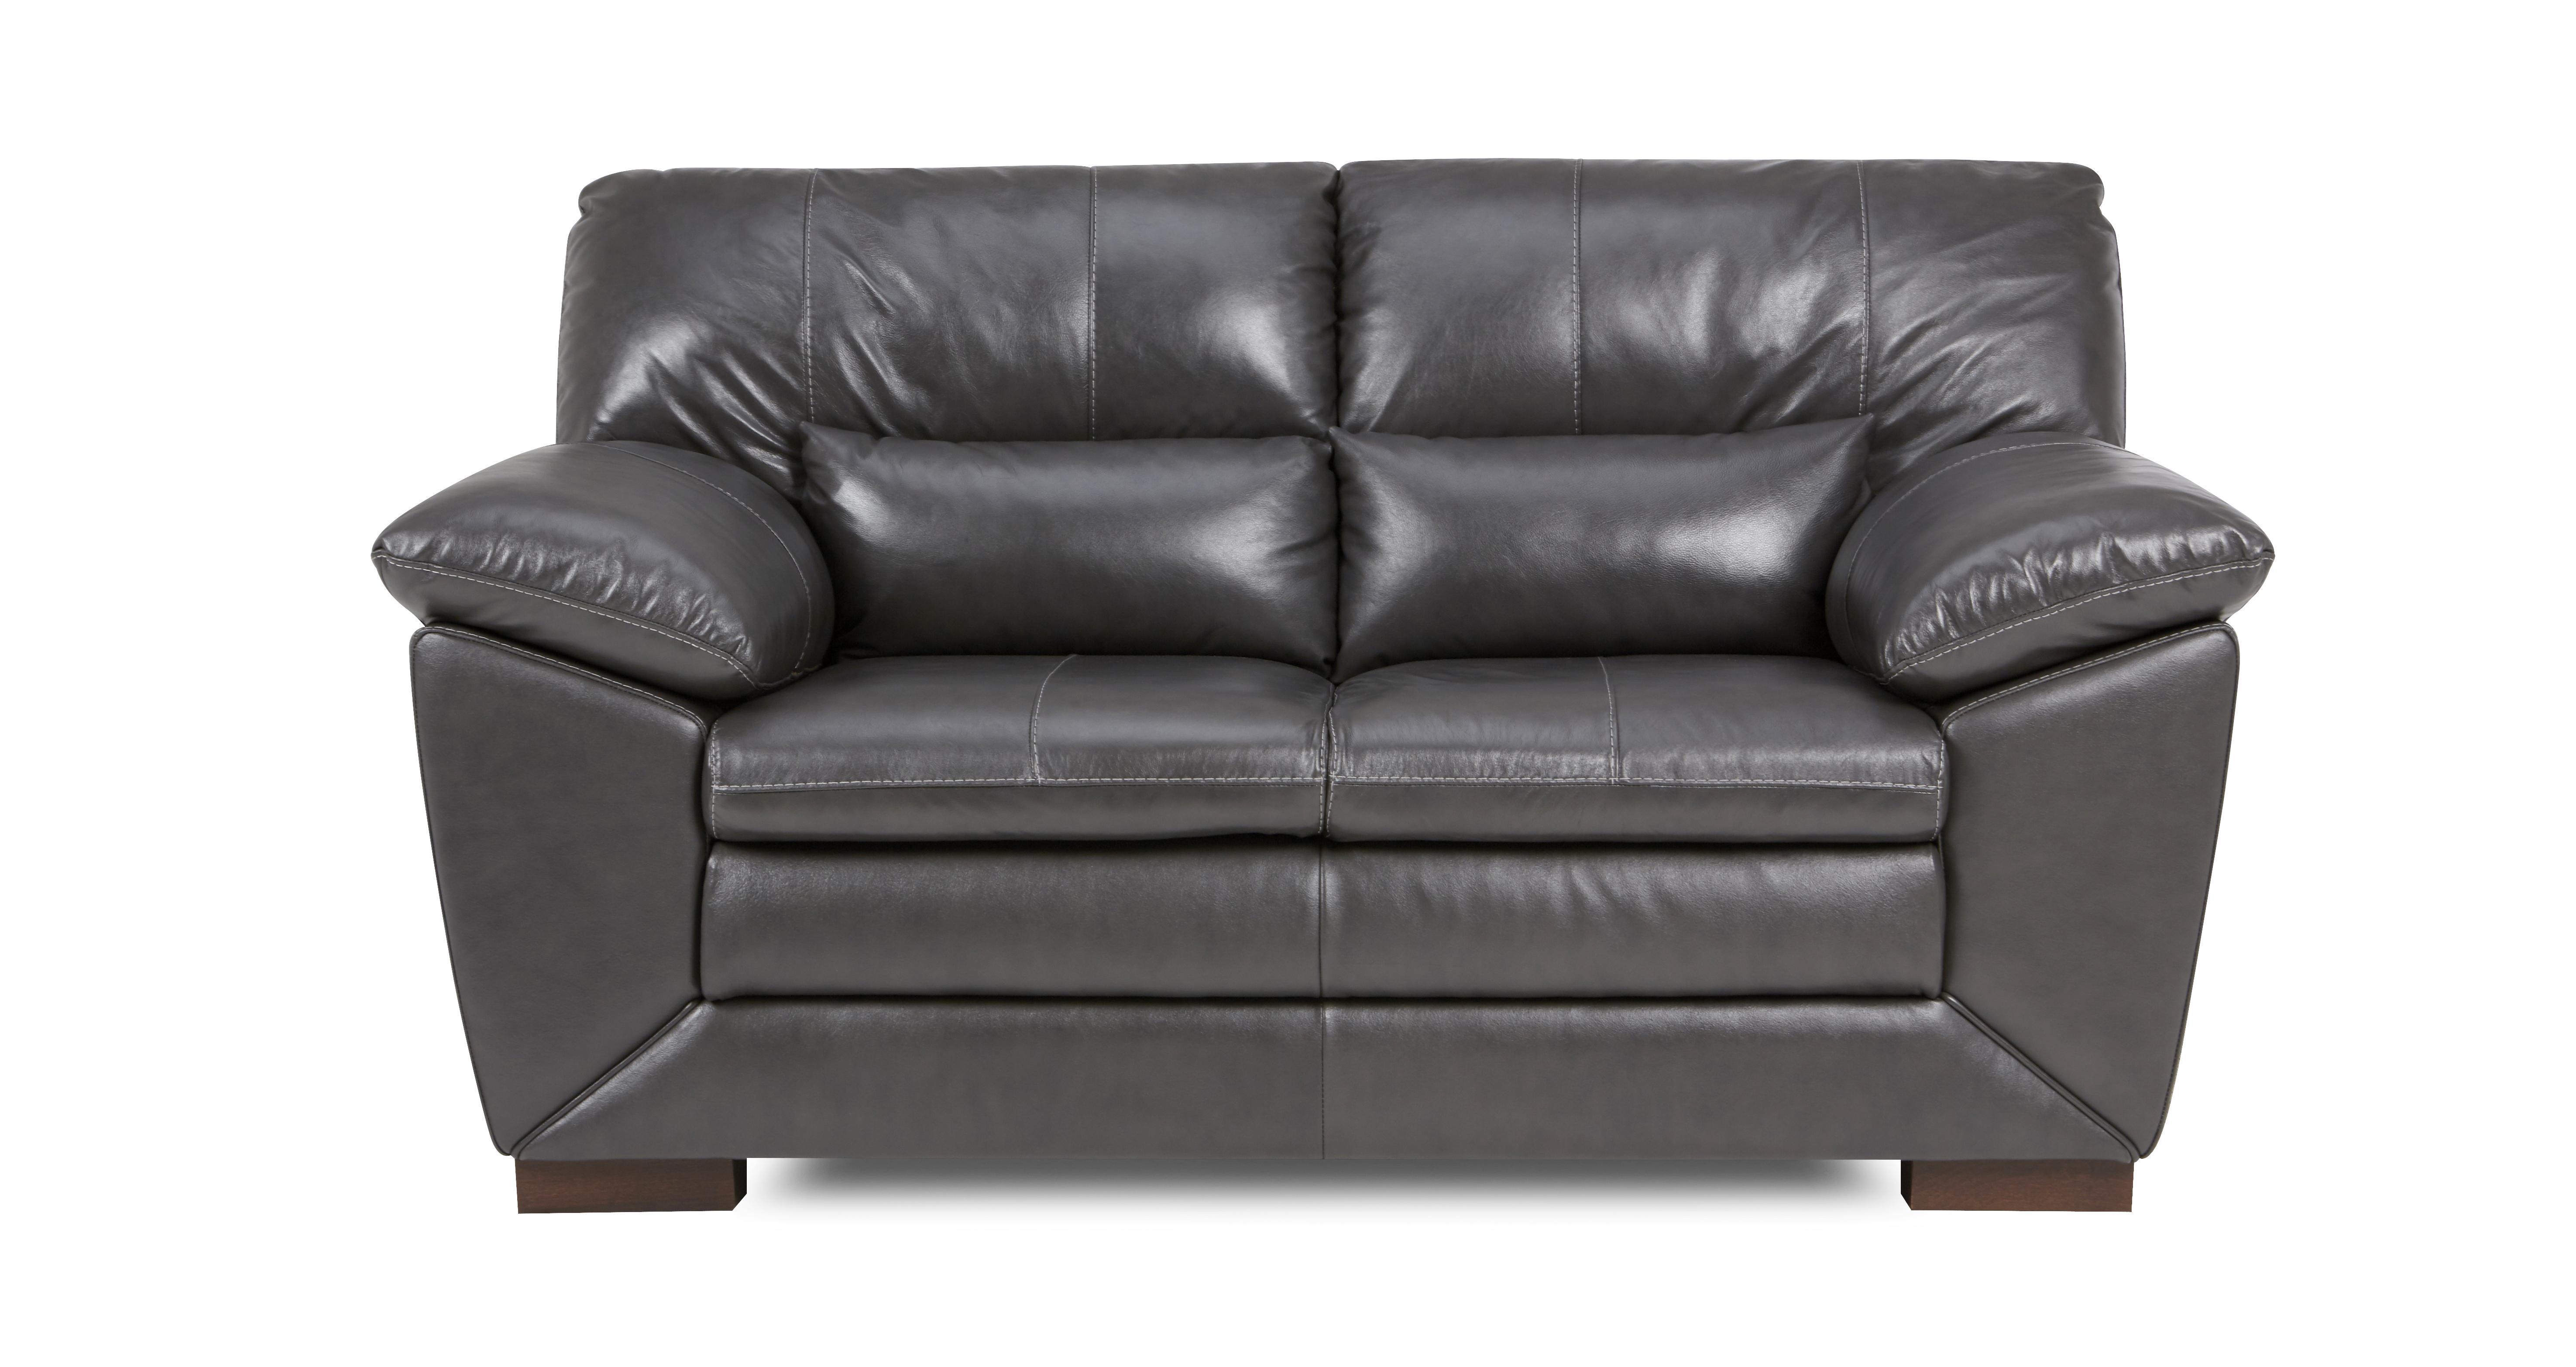 Global Clearance 2 Seater Sofa Milan